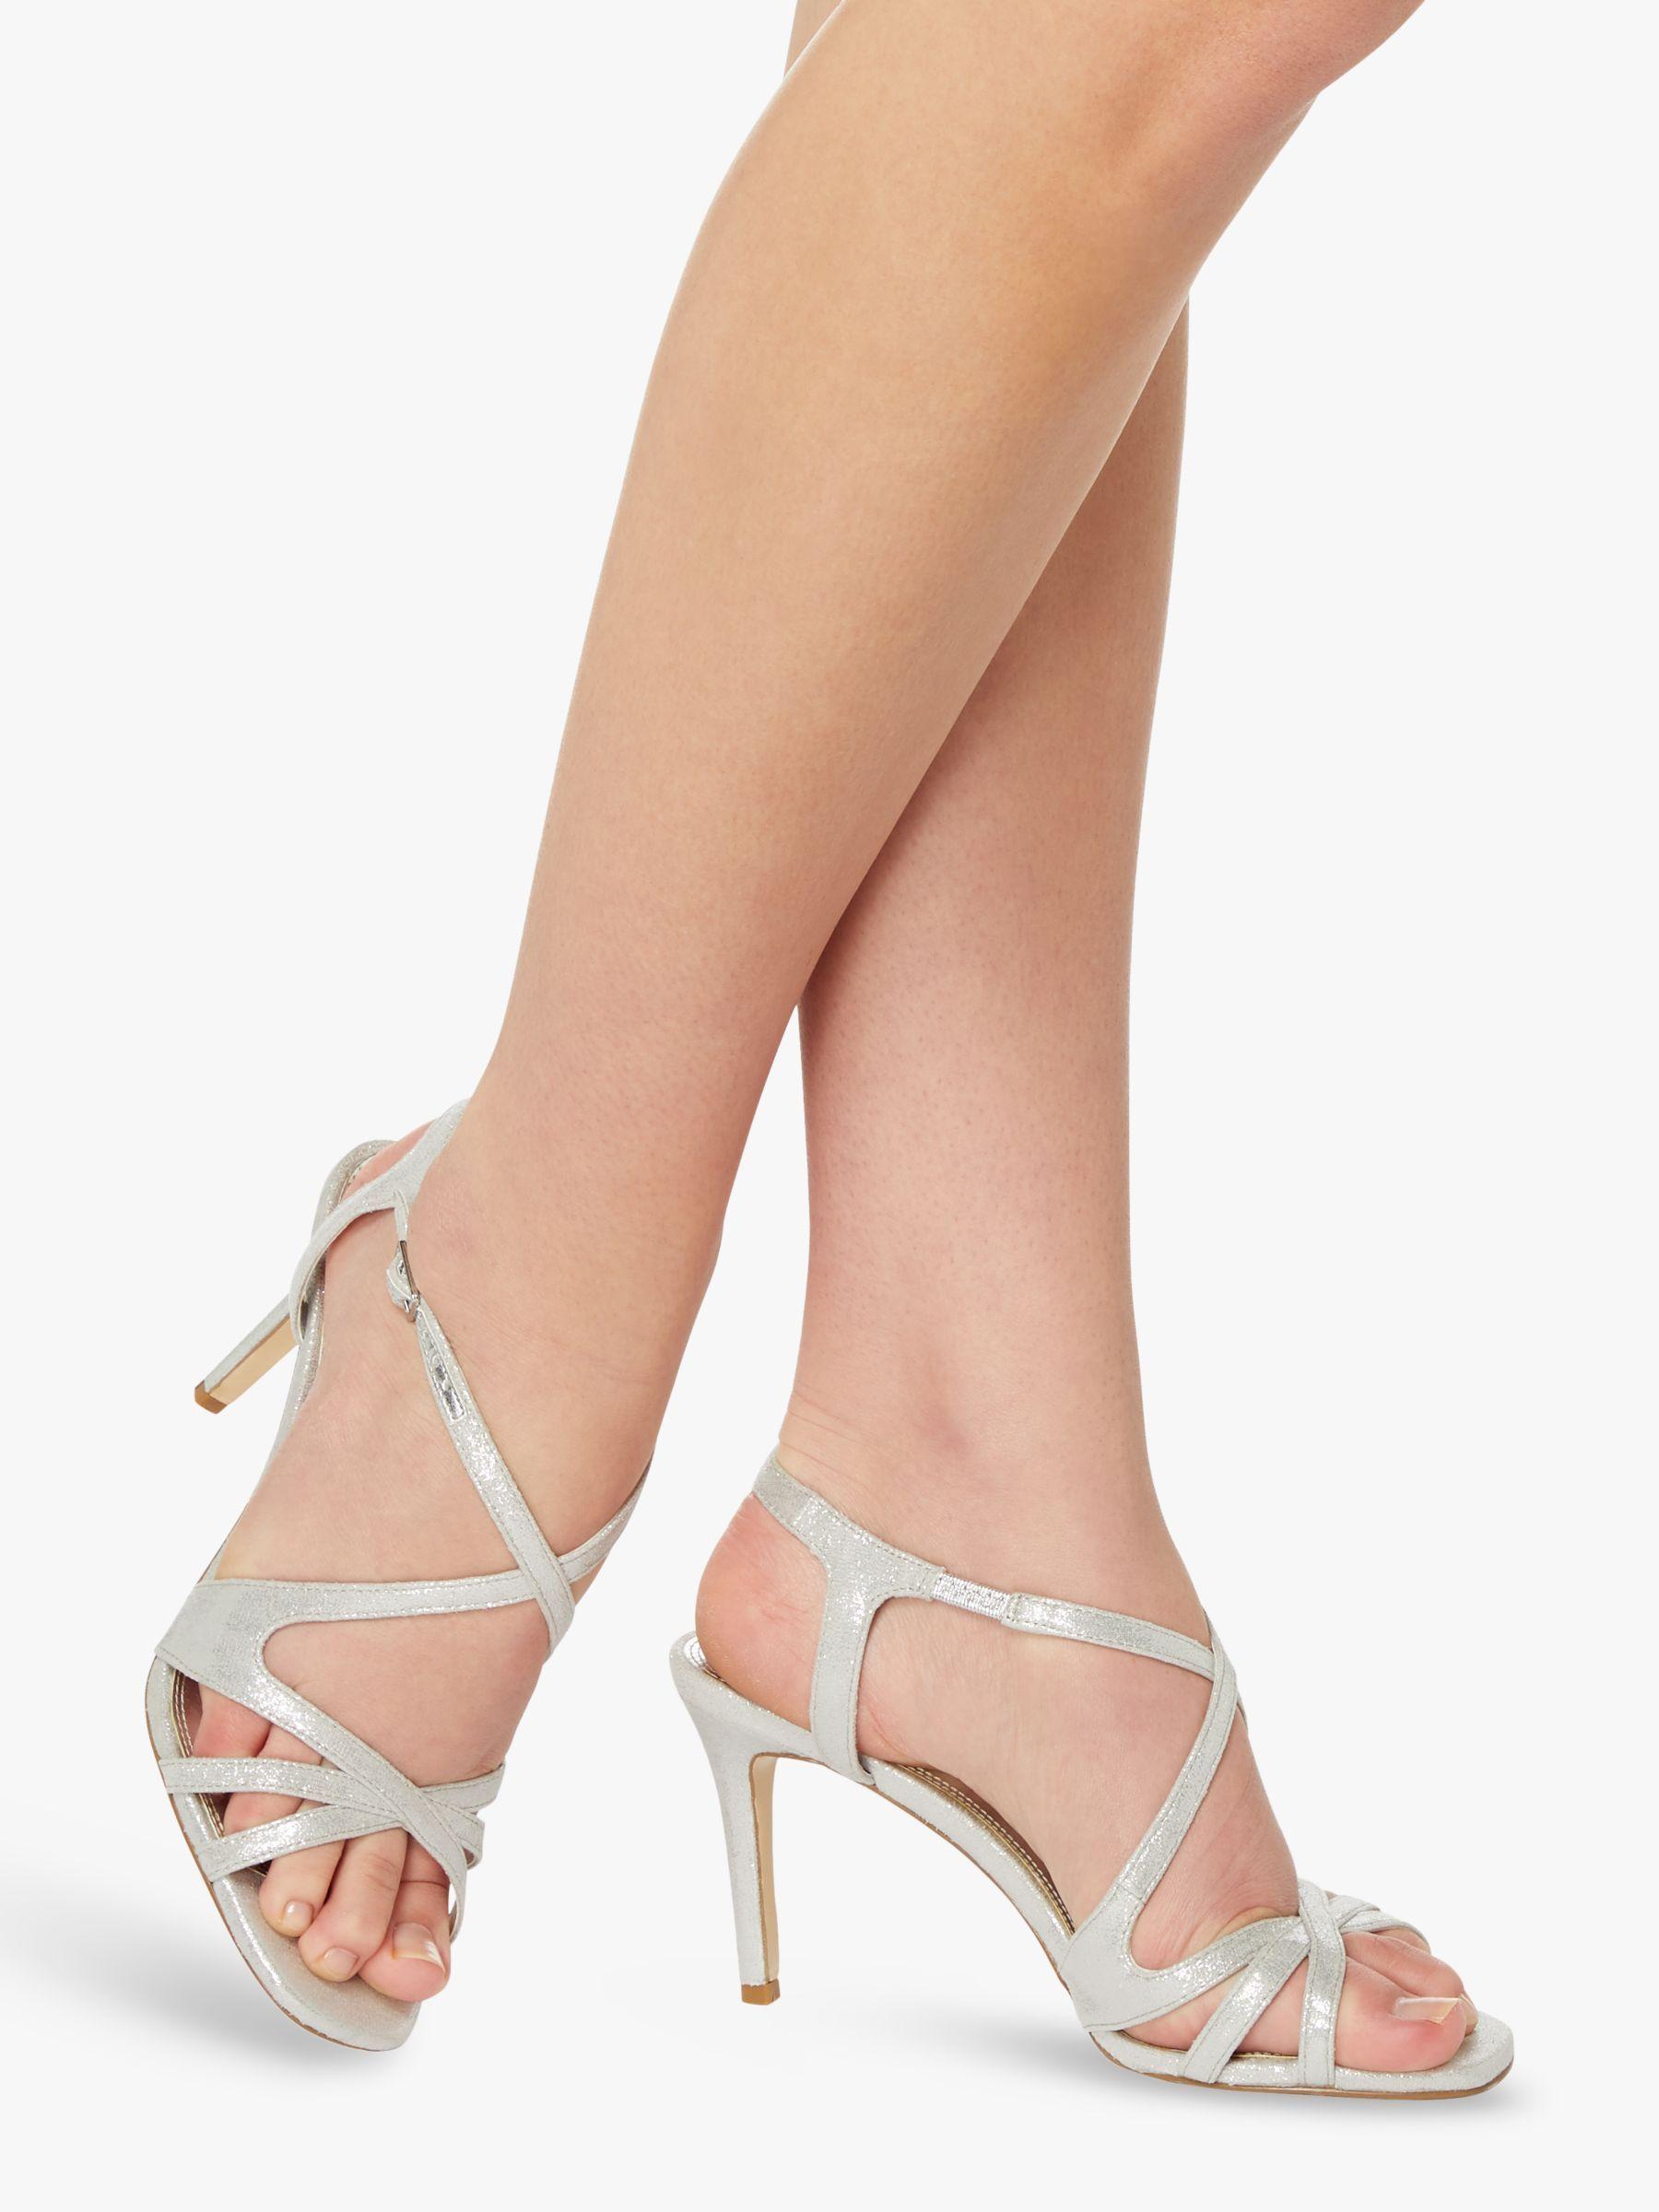 Dune Mysticks Strappy Stiletto Heels